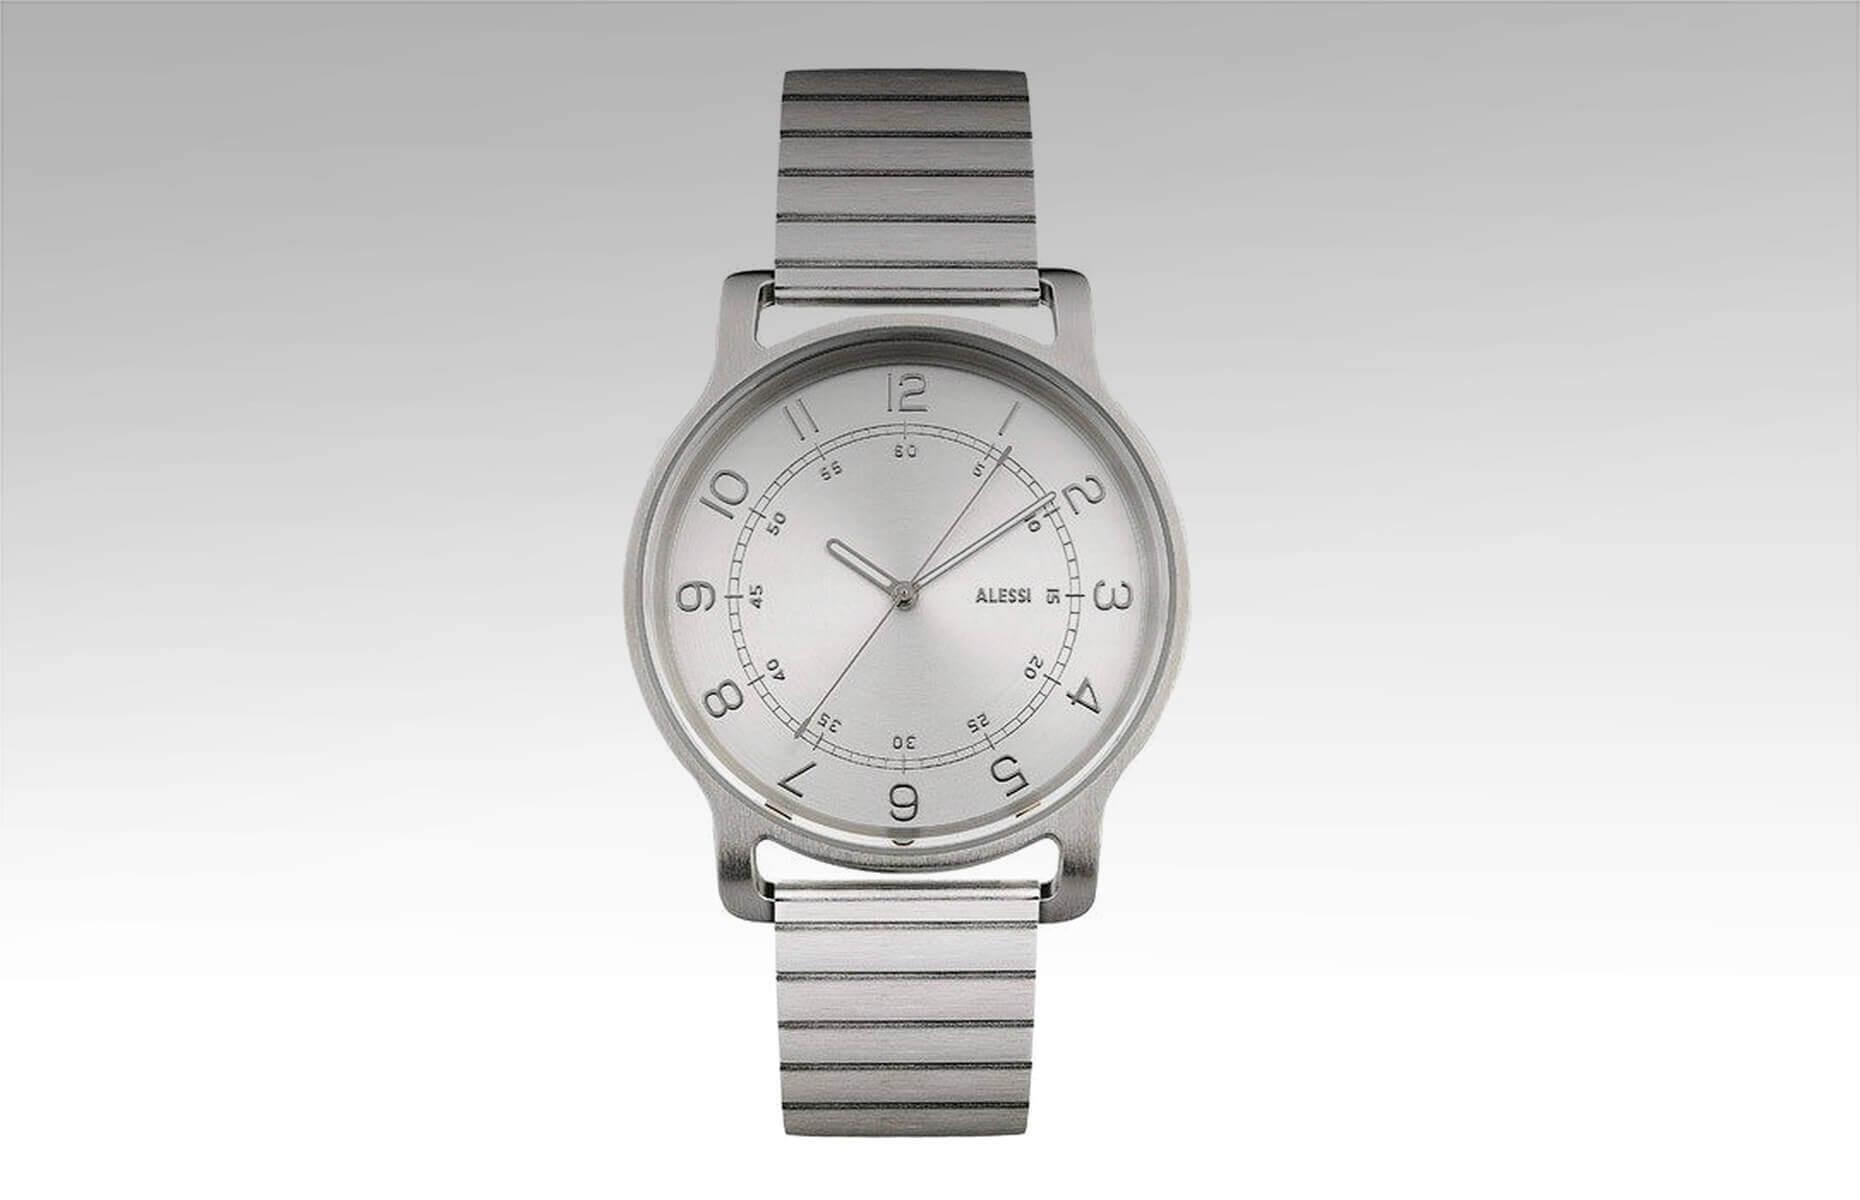 1b4e43f796d54d Męski zegarek l'orologio ze stalową bransoletą | Alessi